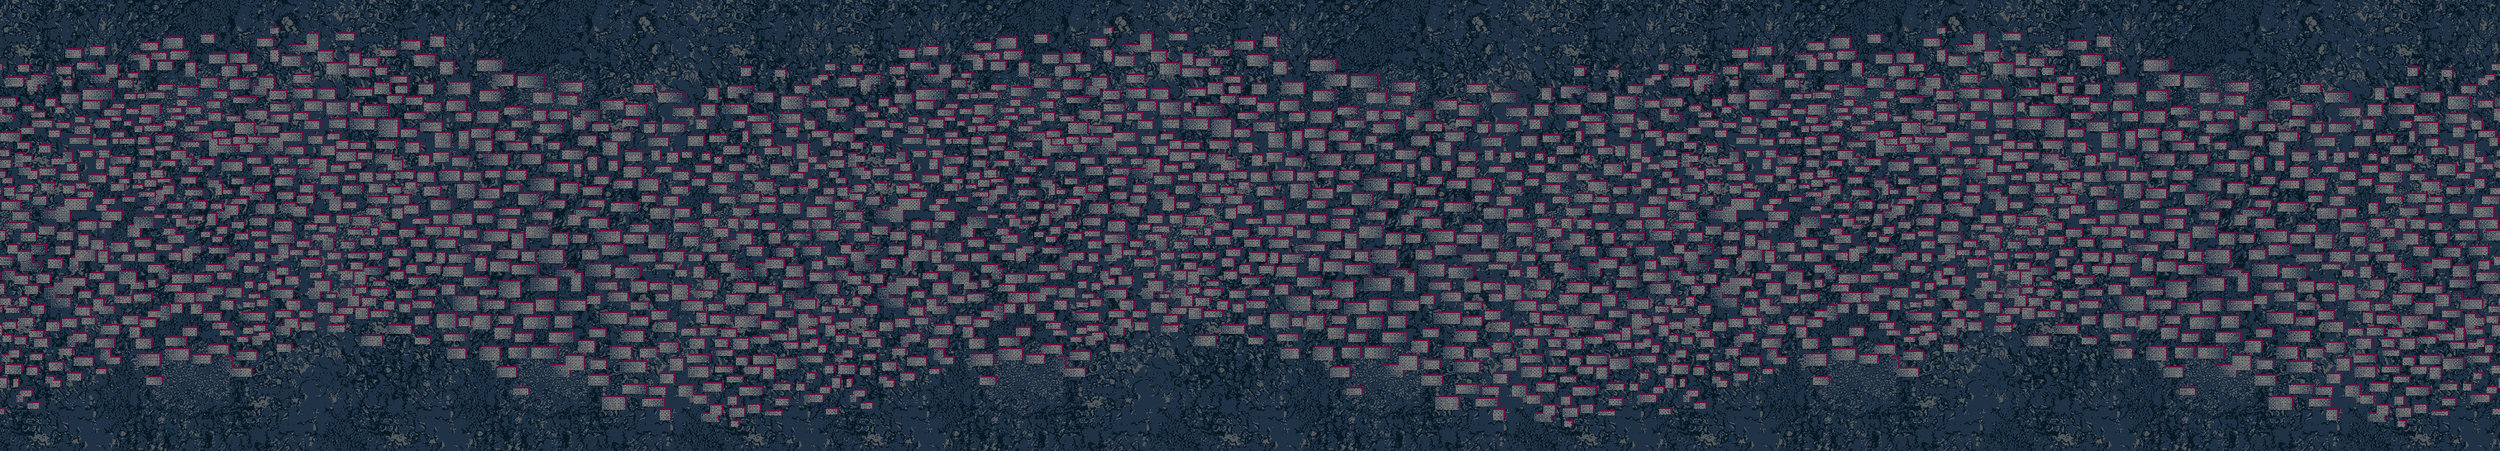 Axminster- NX02917R1